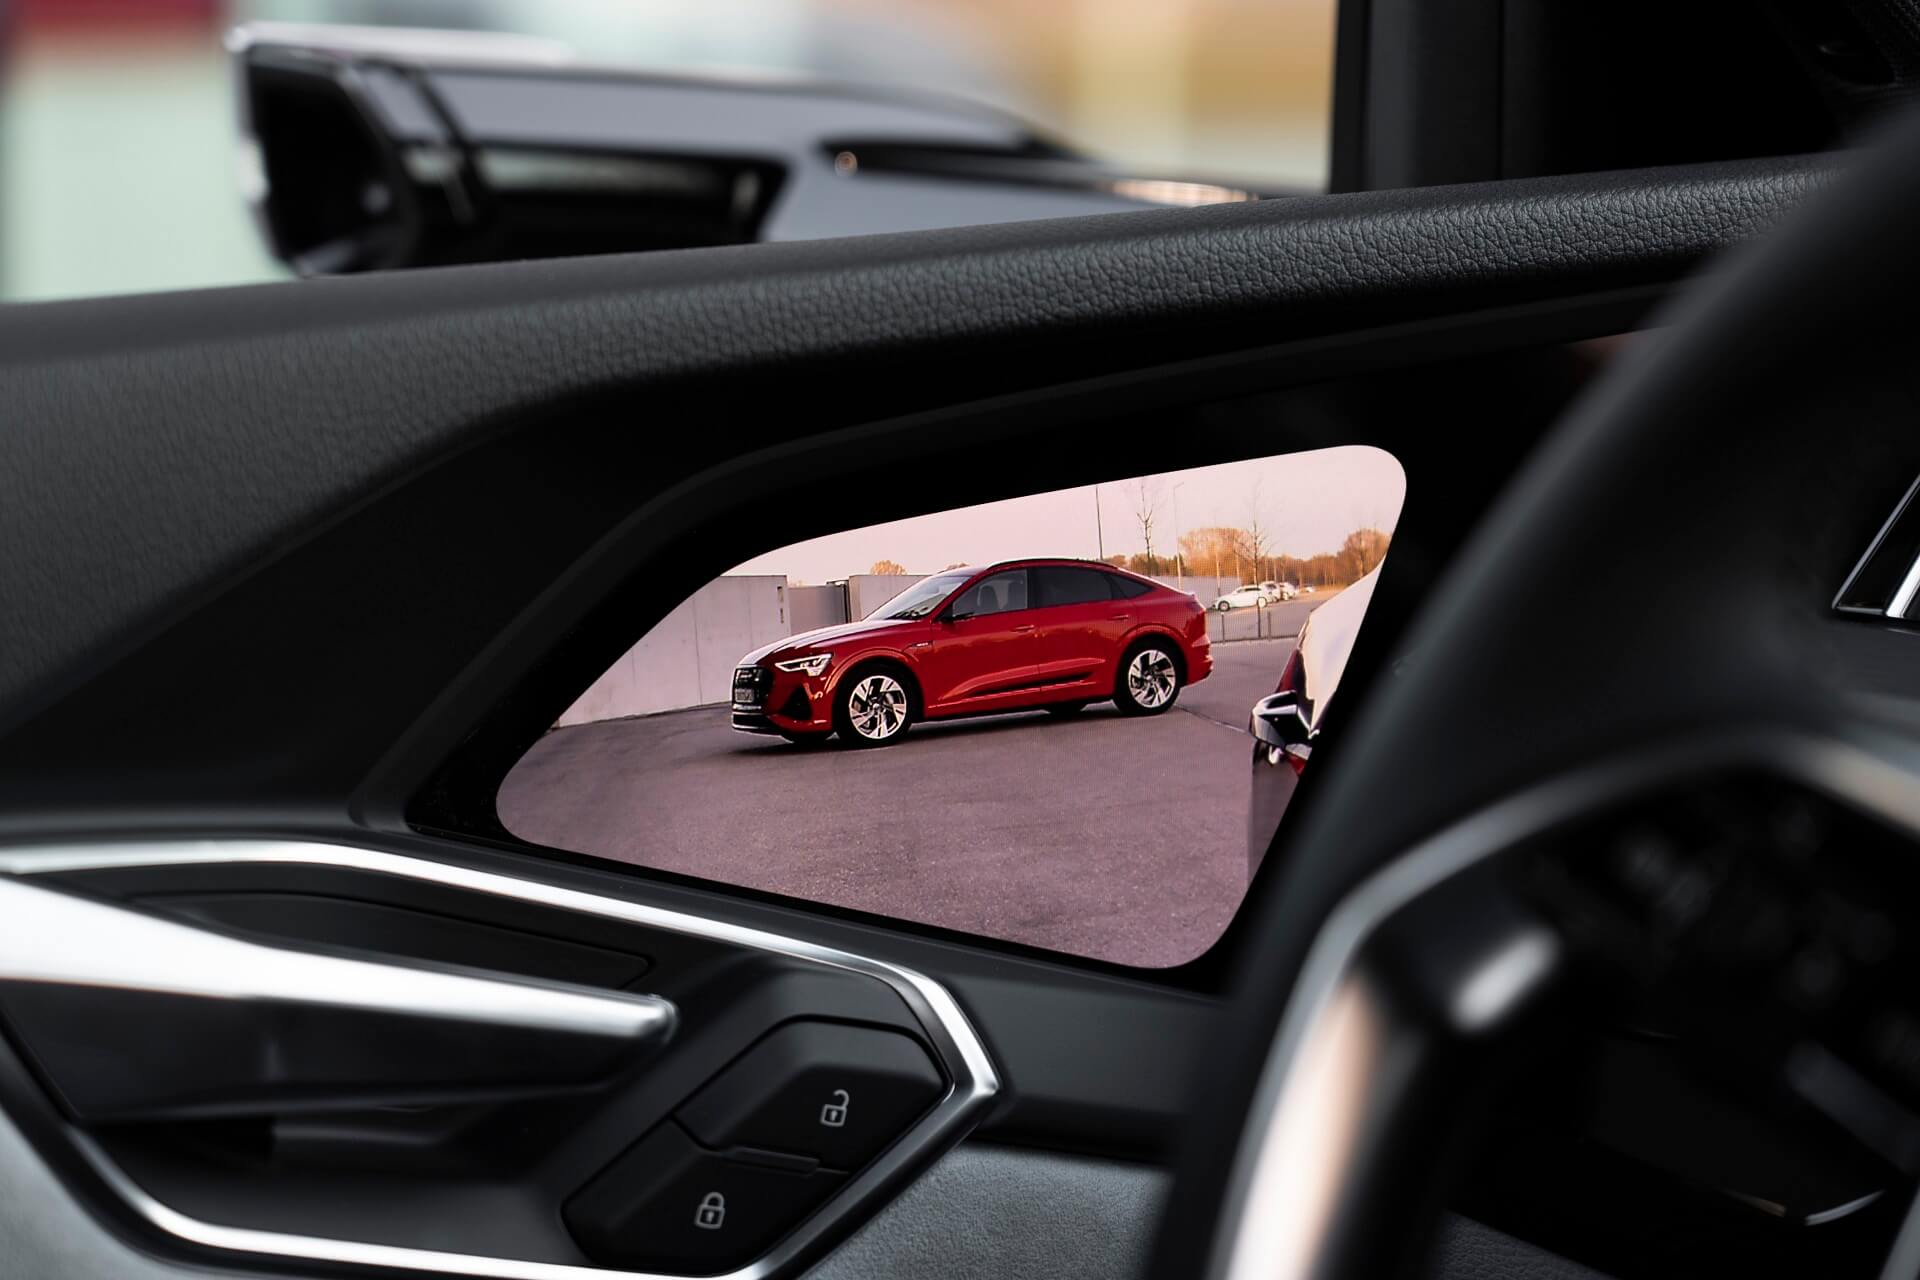 Audi e-tron Sportback - Εικονικοί εξωτερικοί καθρέφτες με κάμερες